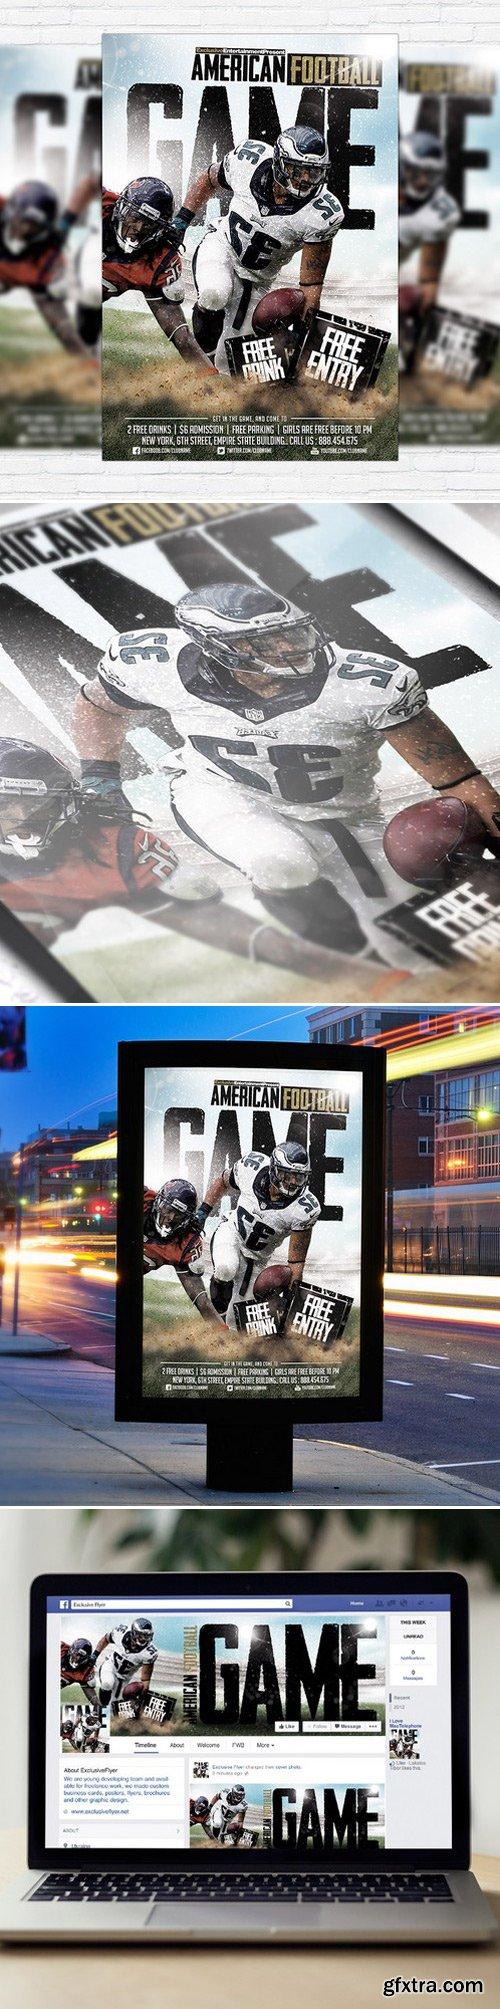 AMERICAN FOOTBALL GAME – PREMIUM FLYER TEMPLATE + FACEBOOK COVER